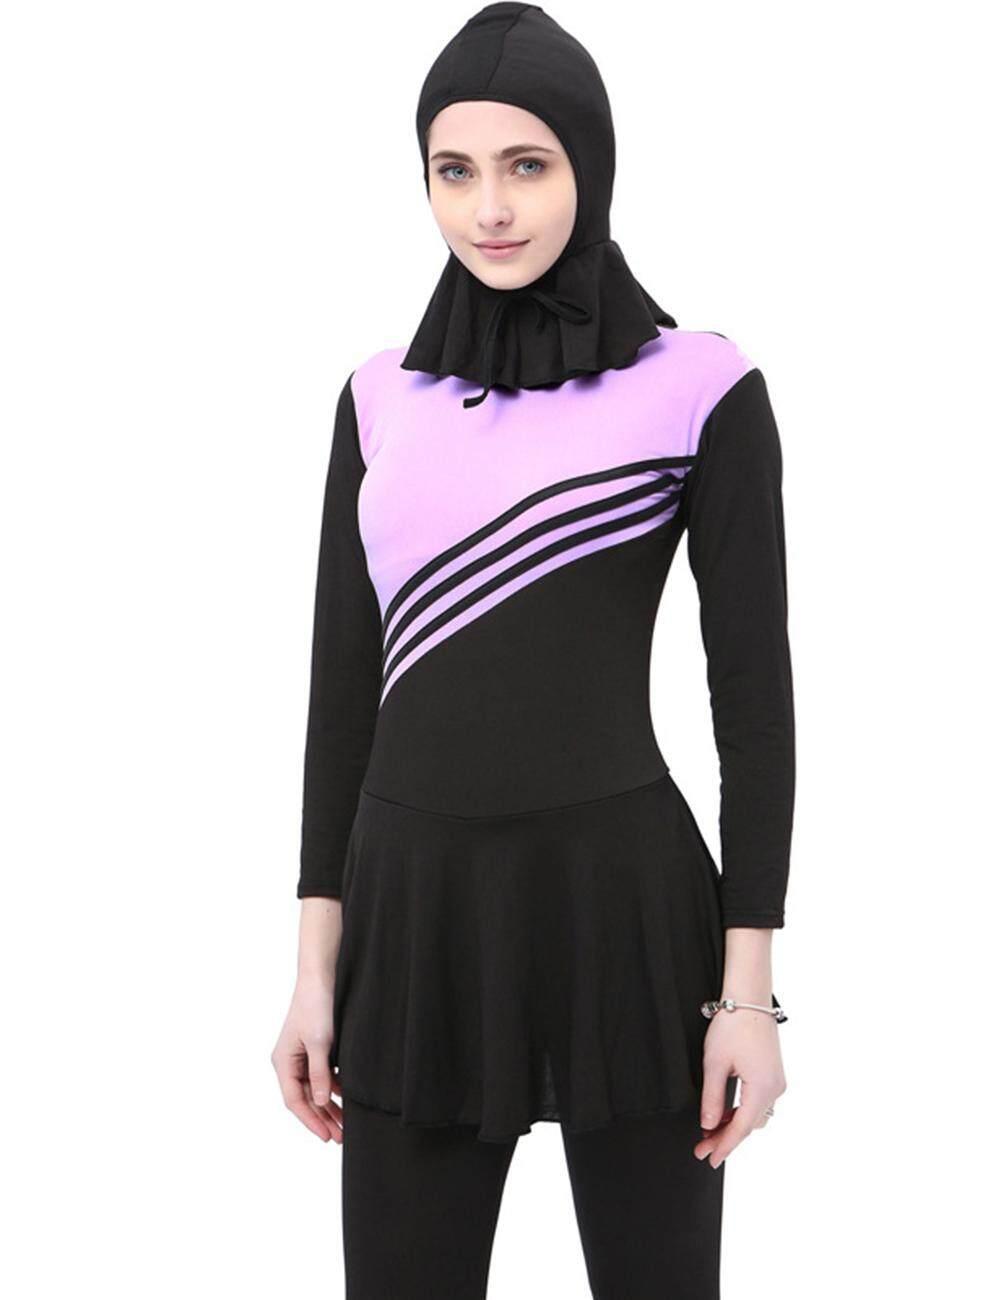 00bae5ce0e630 Wonderful Toy Women Stylish Slim Diving Suit Slim Breathable Swimsuit  Conservative Sunscreen Jumpsuit + Head Cover